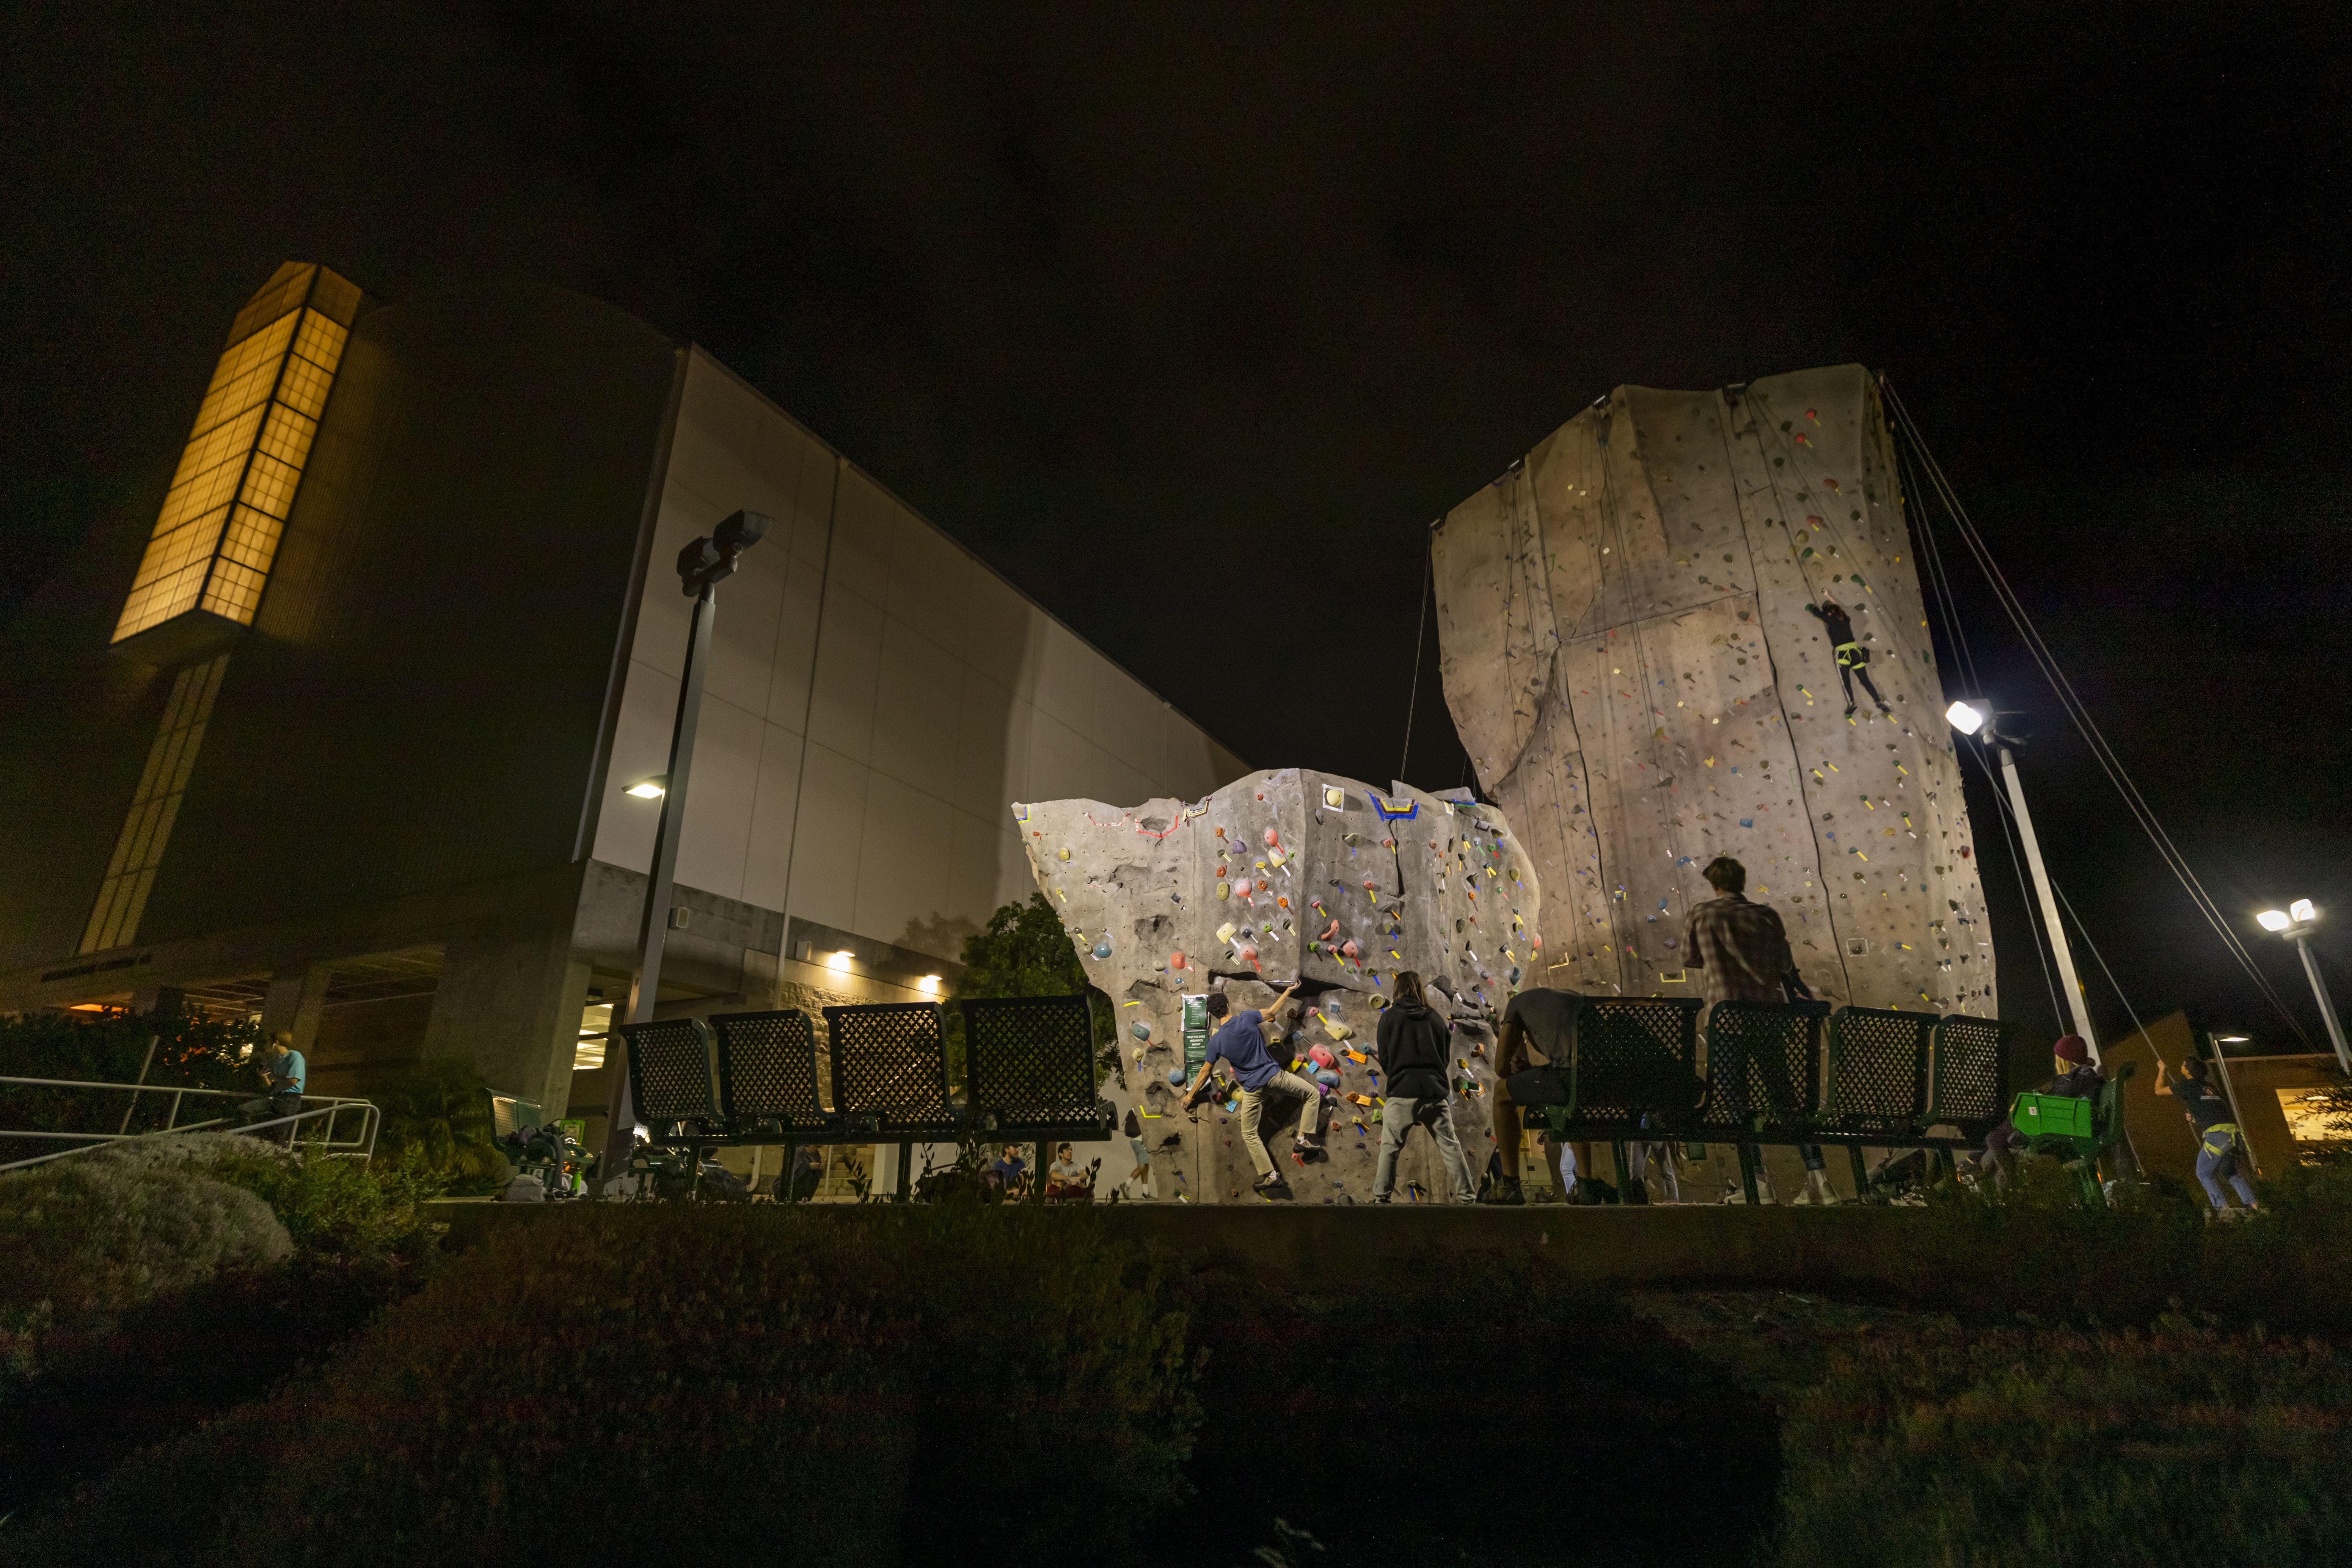 Students climb on the university's rock climbing park at night.